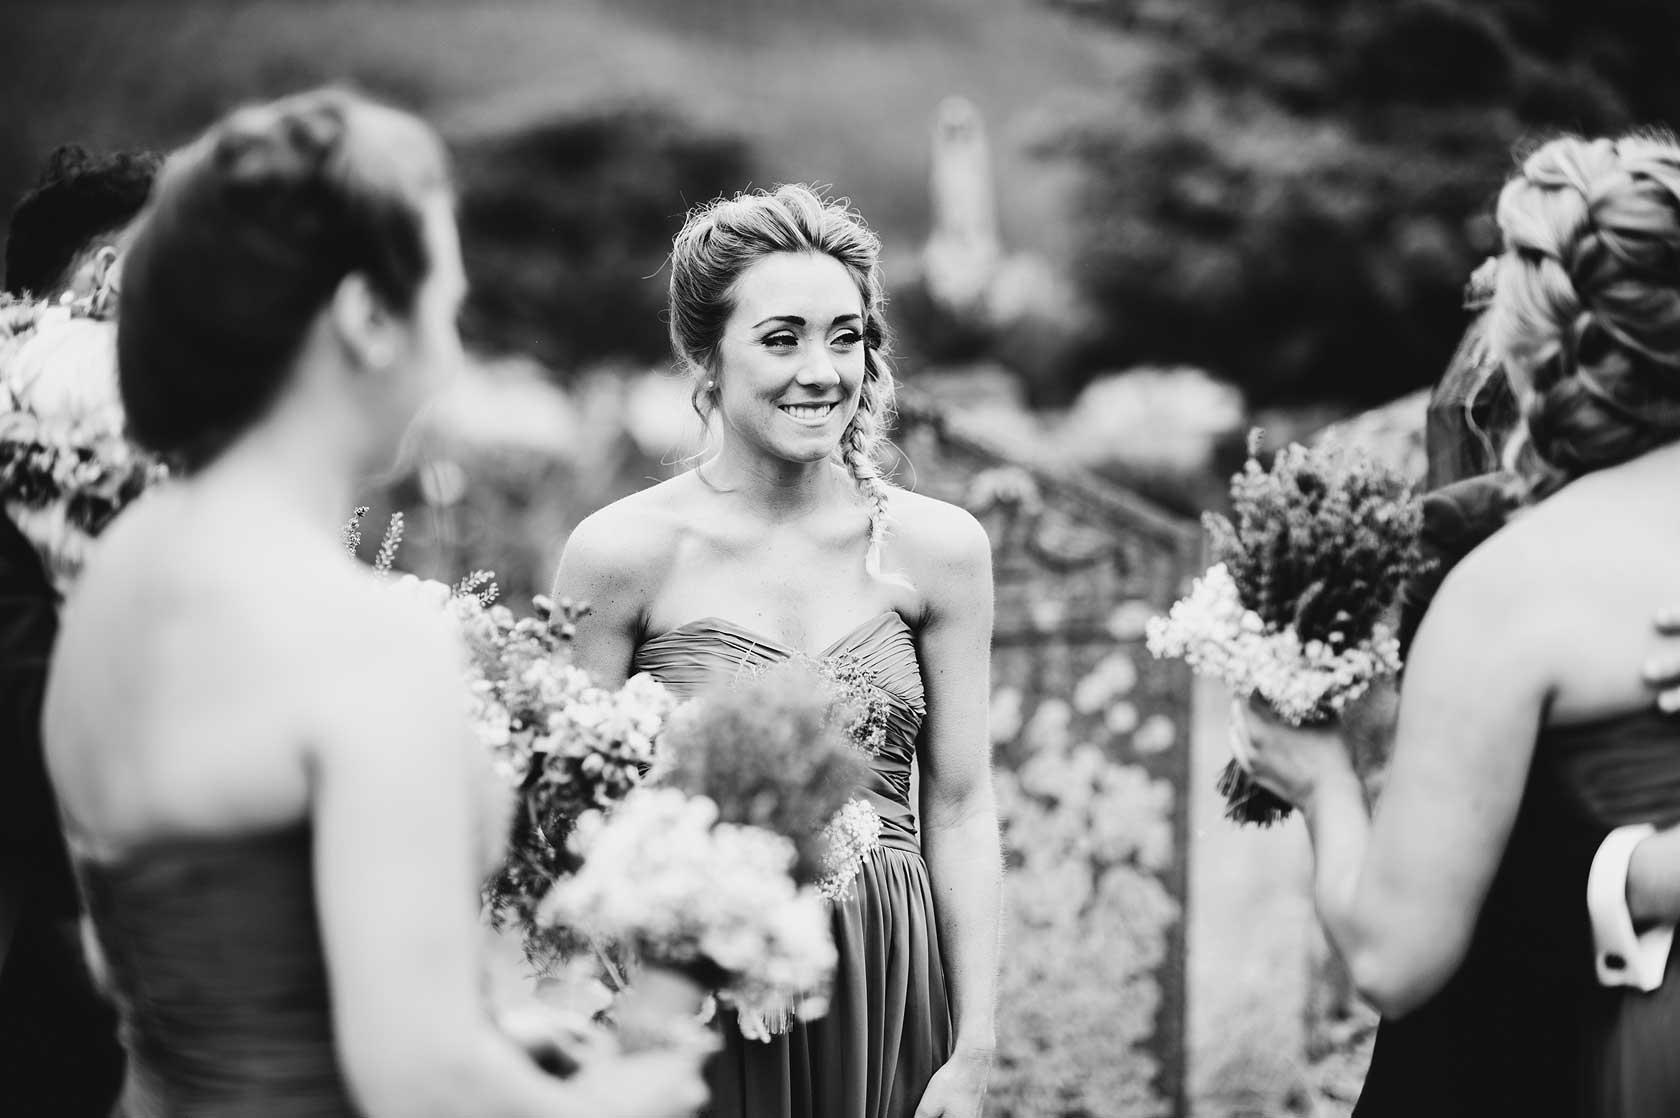 Wedding Photographer at New House Farm